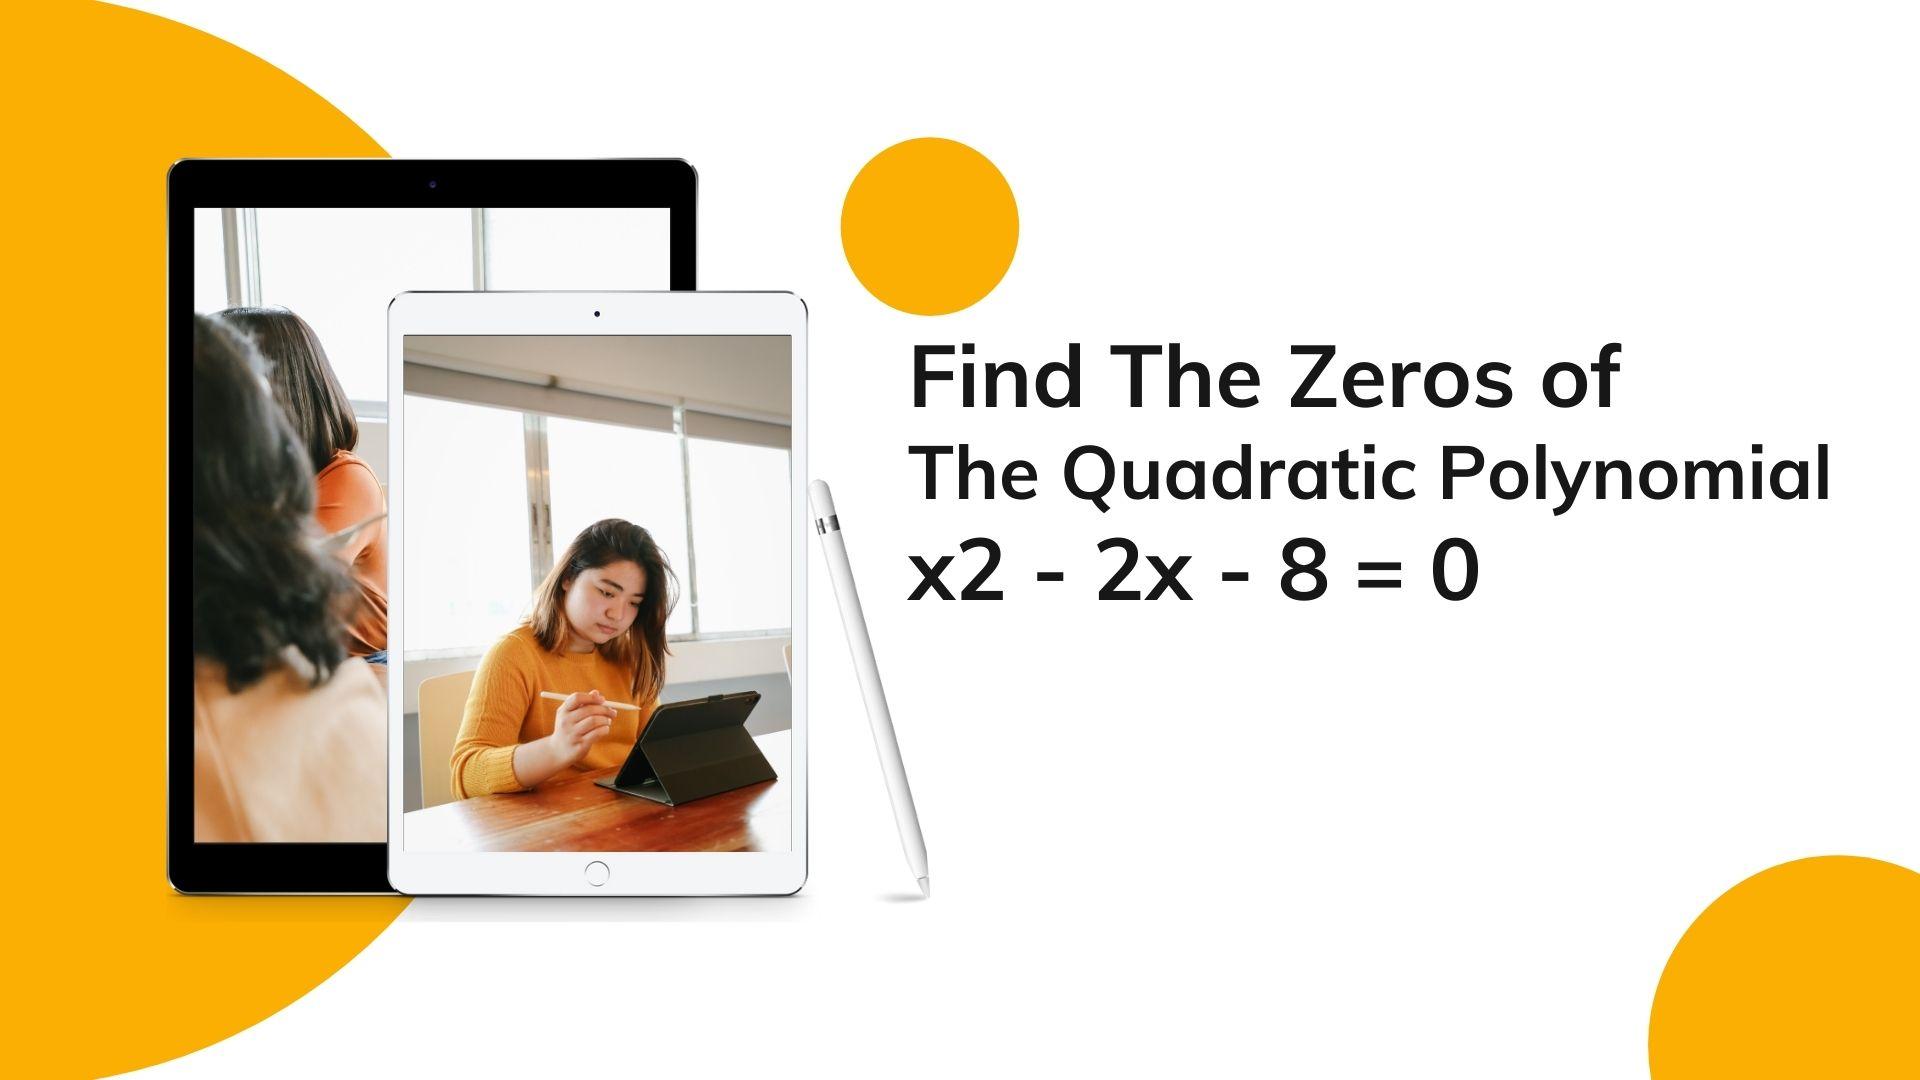 Find The Zeros of The Quadratic Polynomial x2 - 2x - 8 = 0